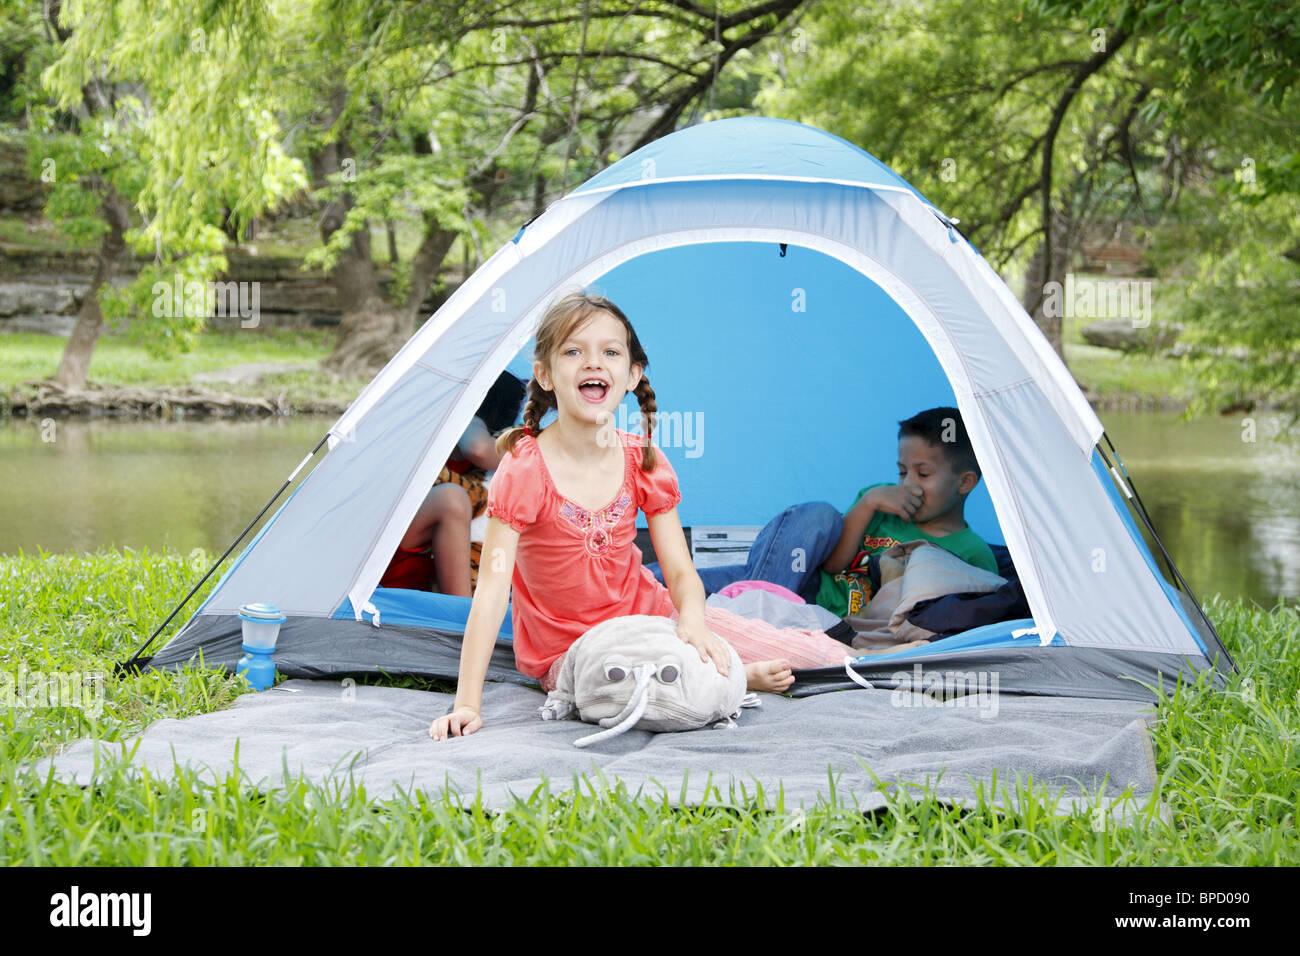 Kids having fun tent camping - Stock Image